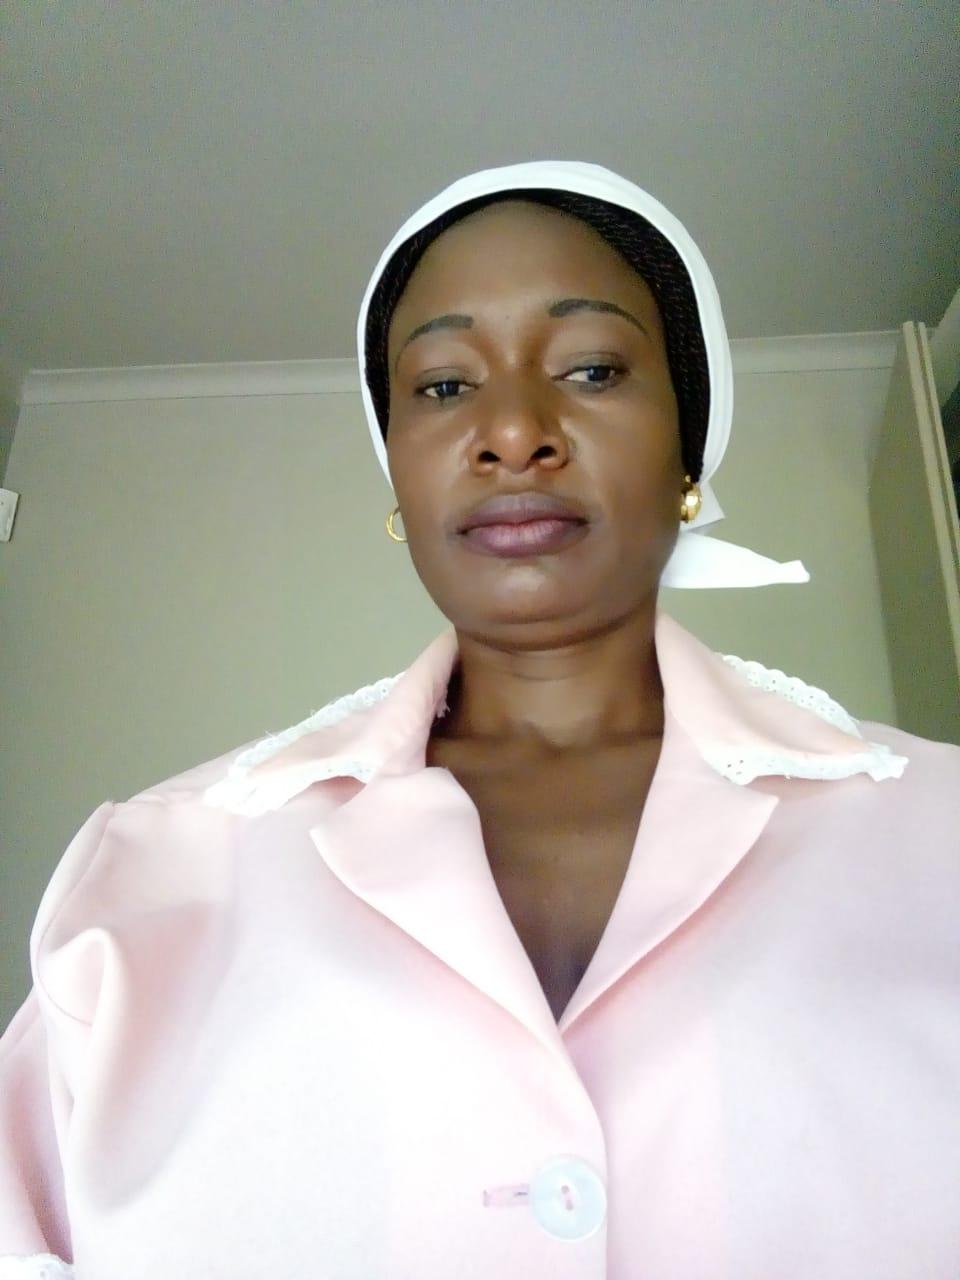 ZIMBABWEAN BABYSITTER/DOMESTIC WORKER